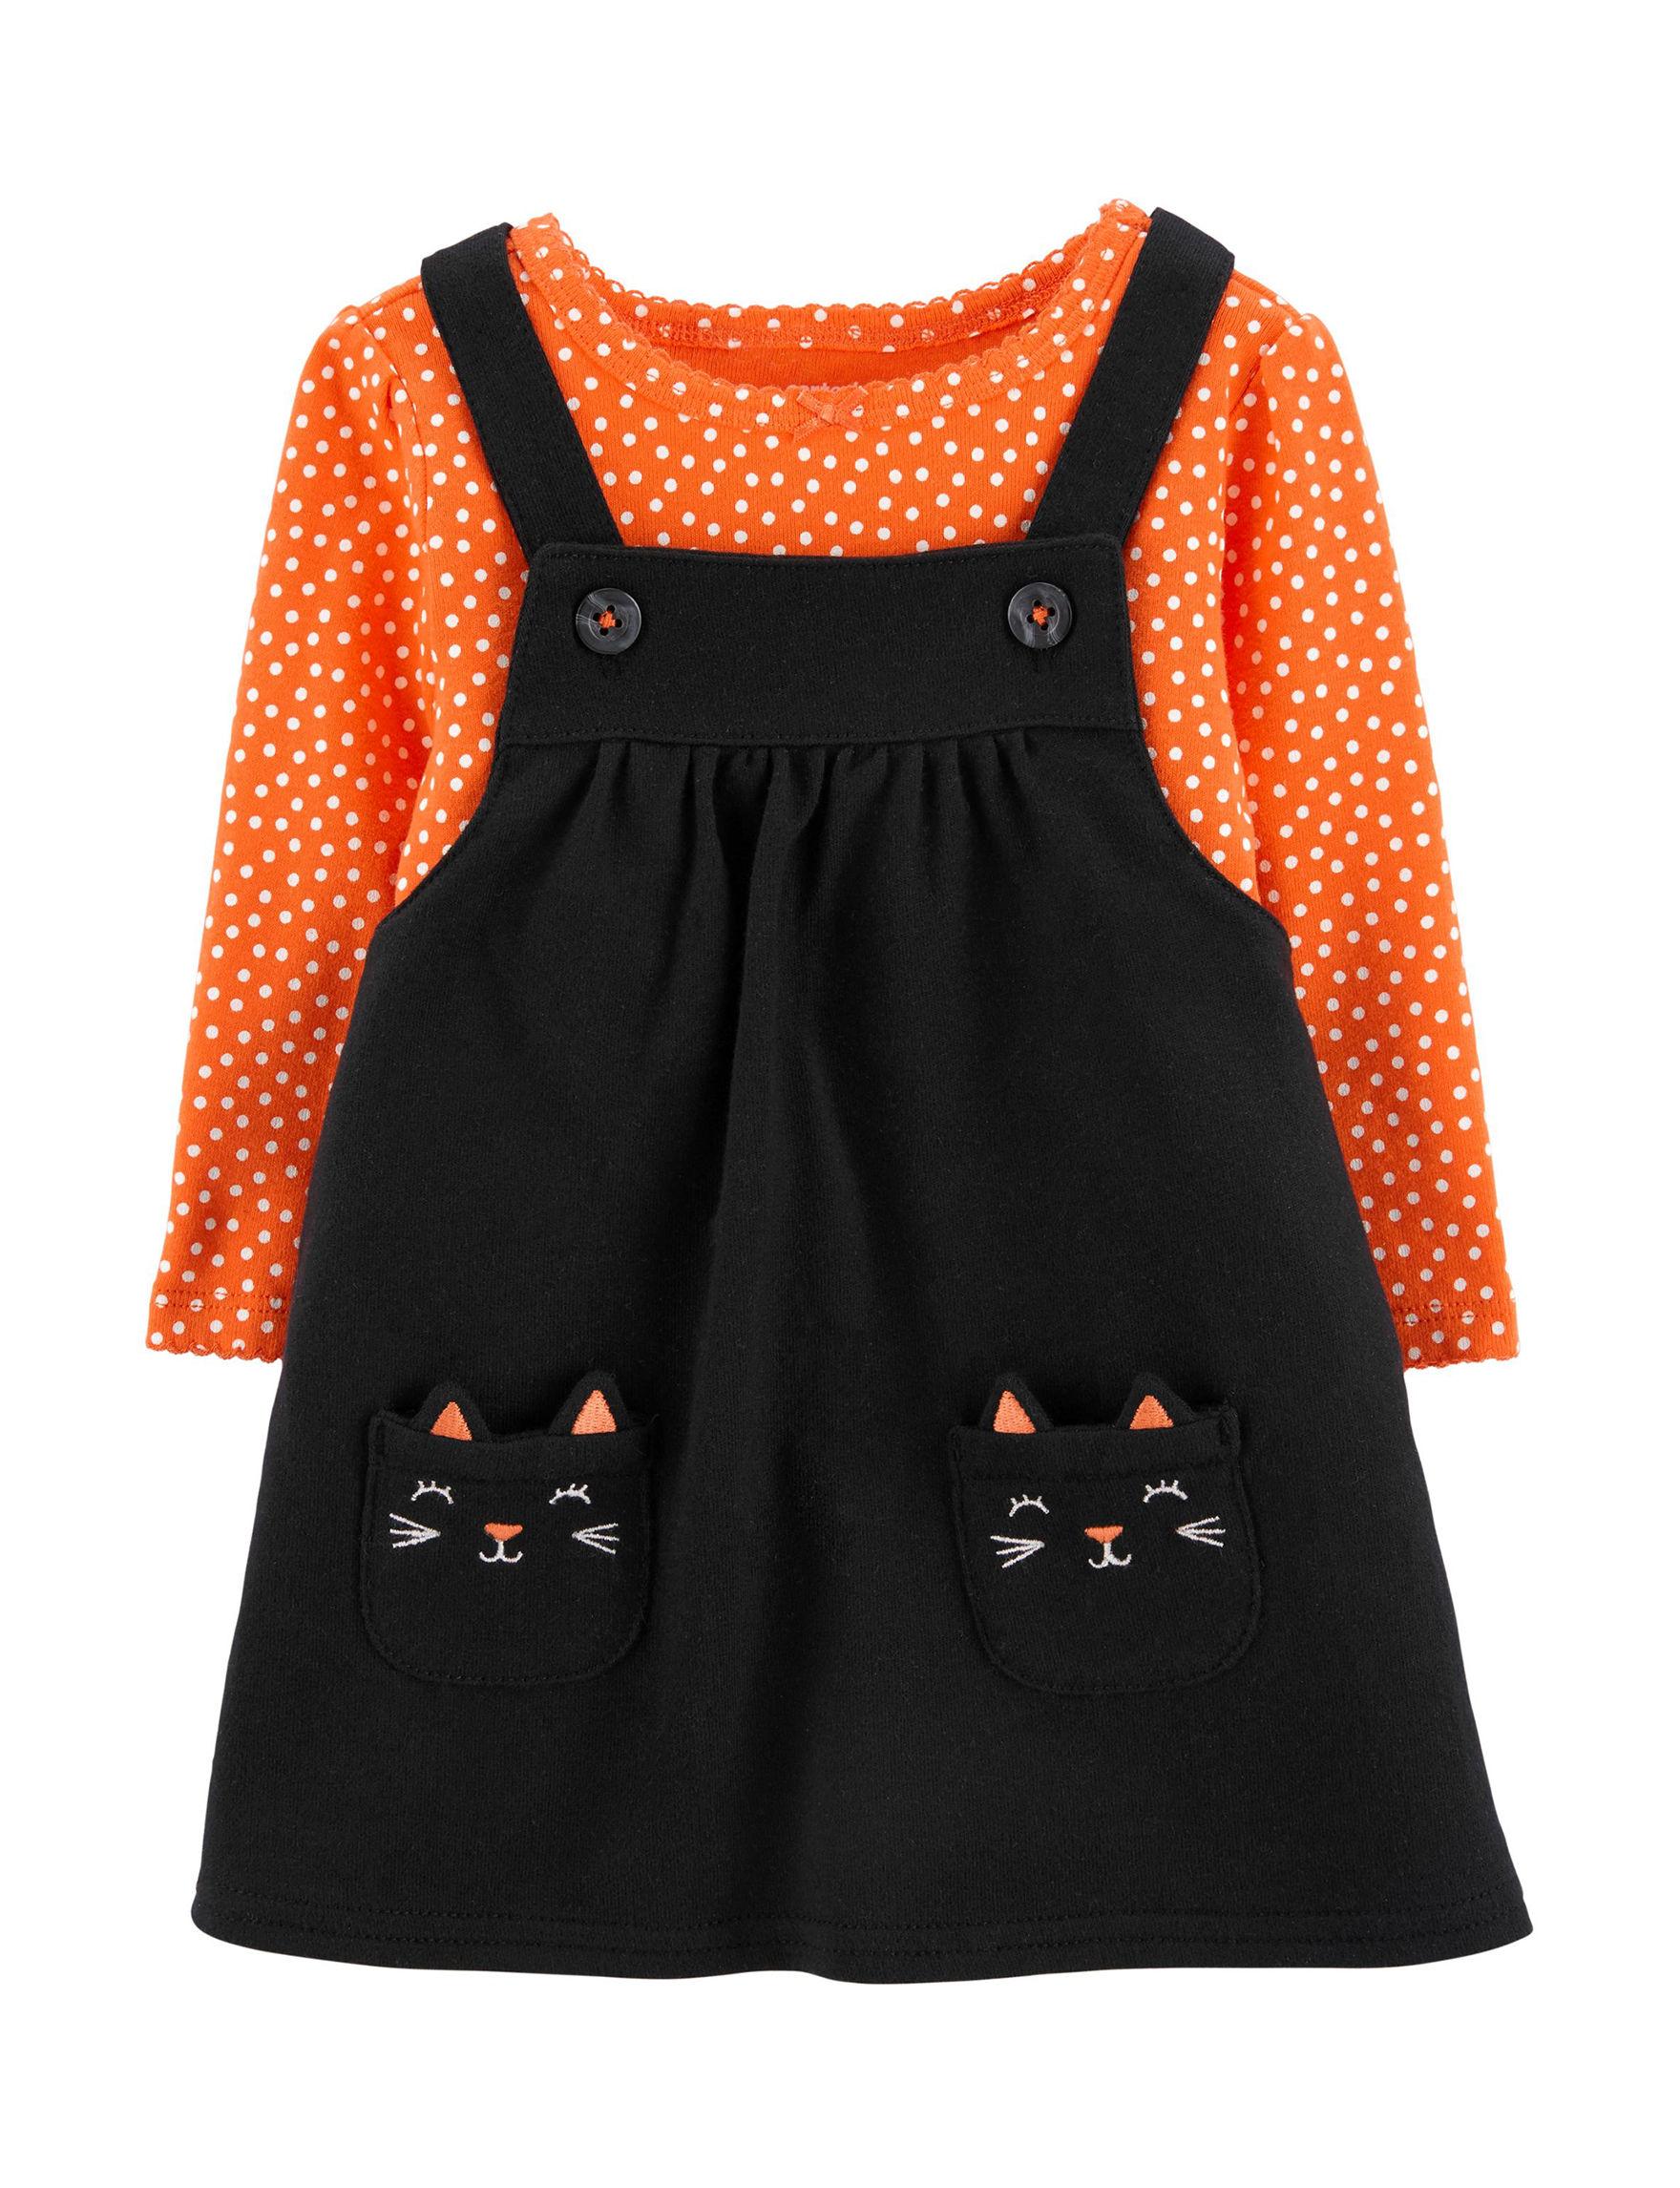 Carter's Black / Orange